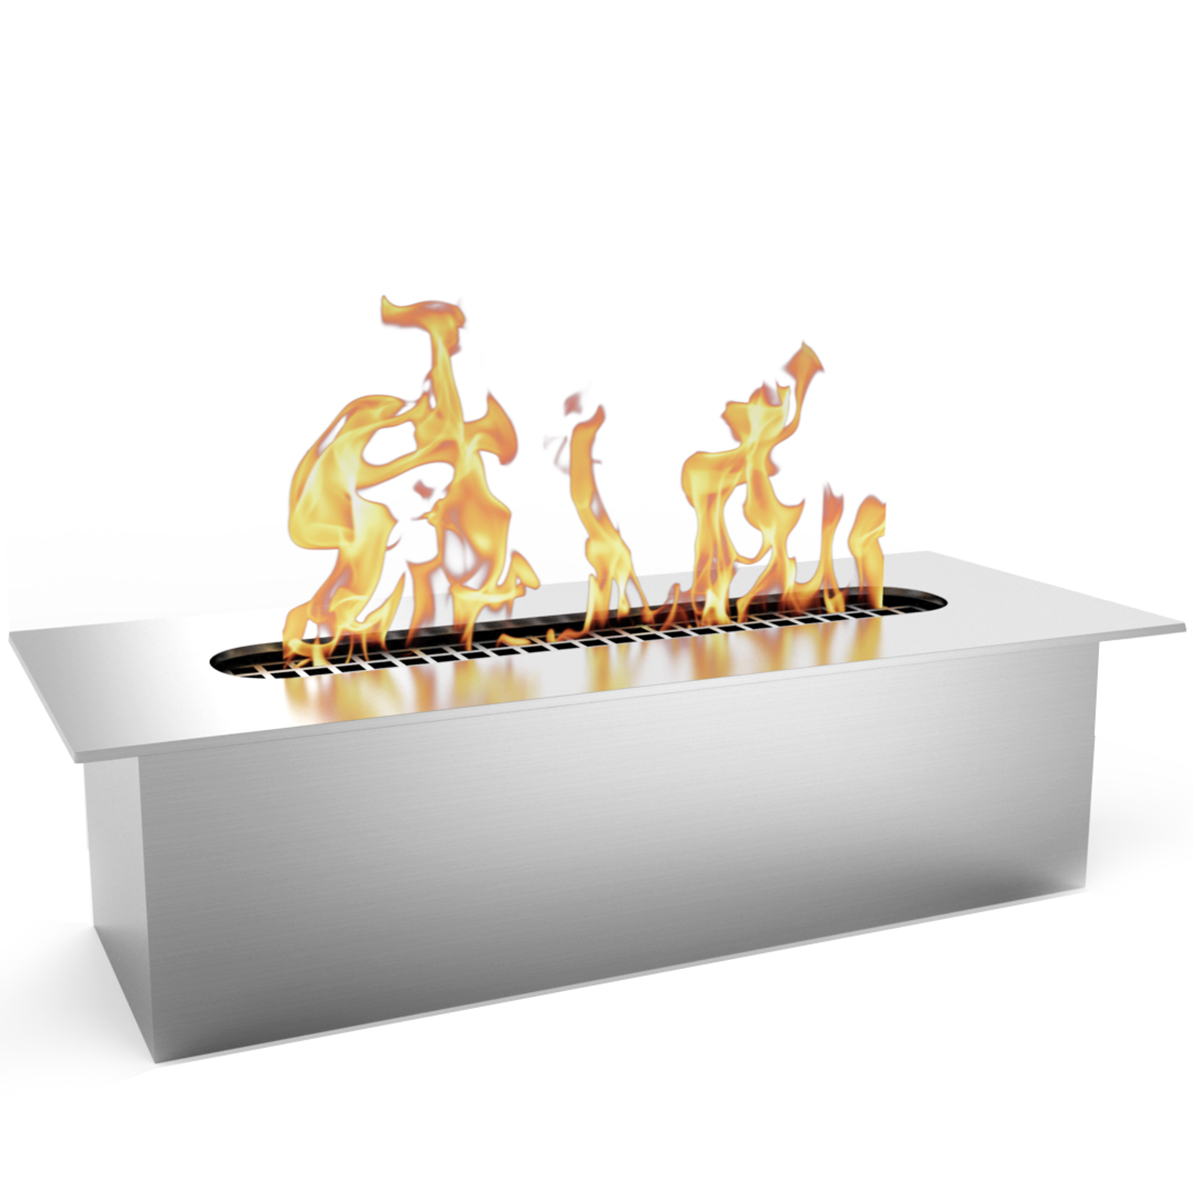 Regal Flame PRO 47 Inch Bio-Ethanol Fireplace Burner Insert 9.9 Liter